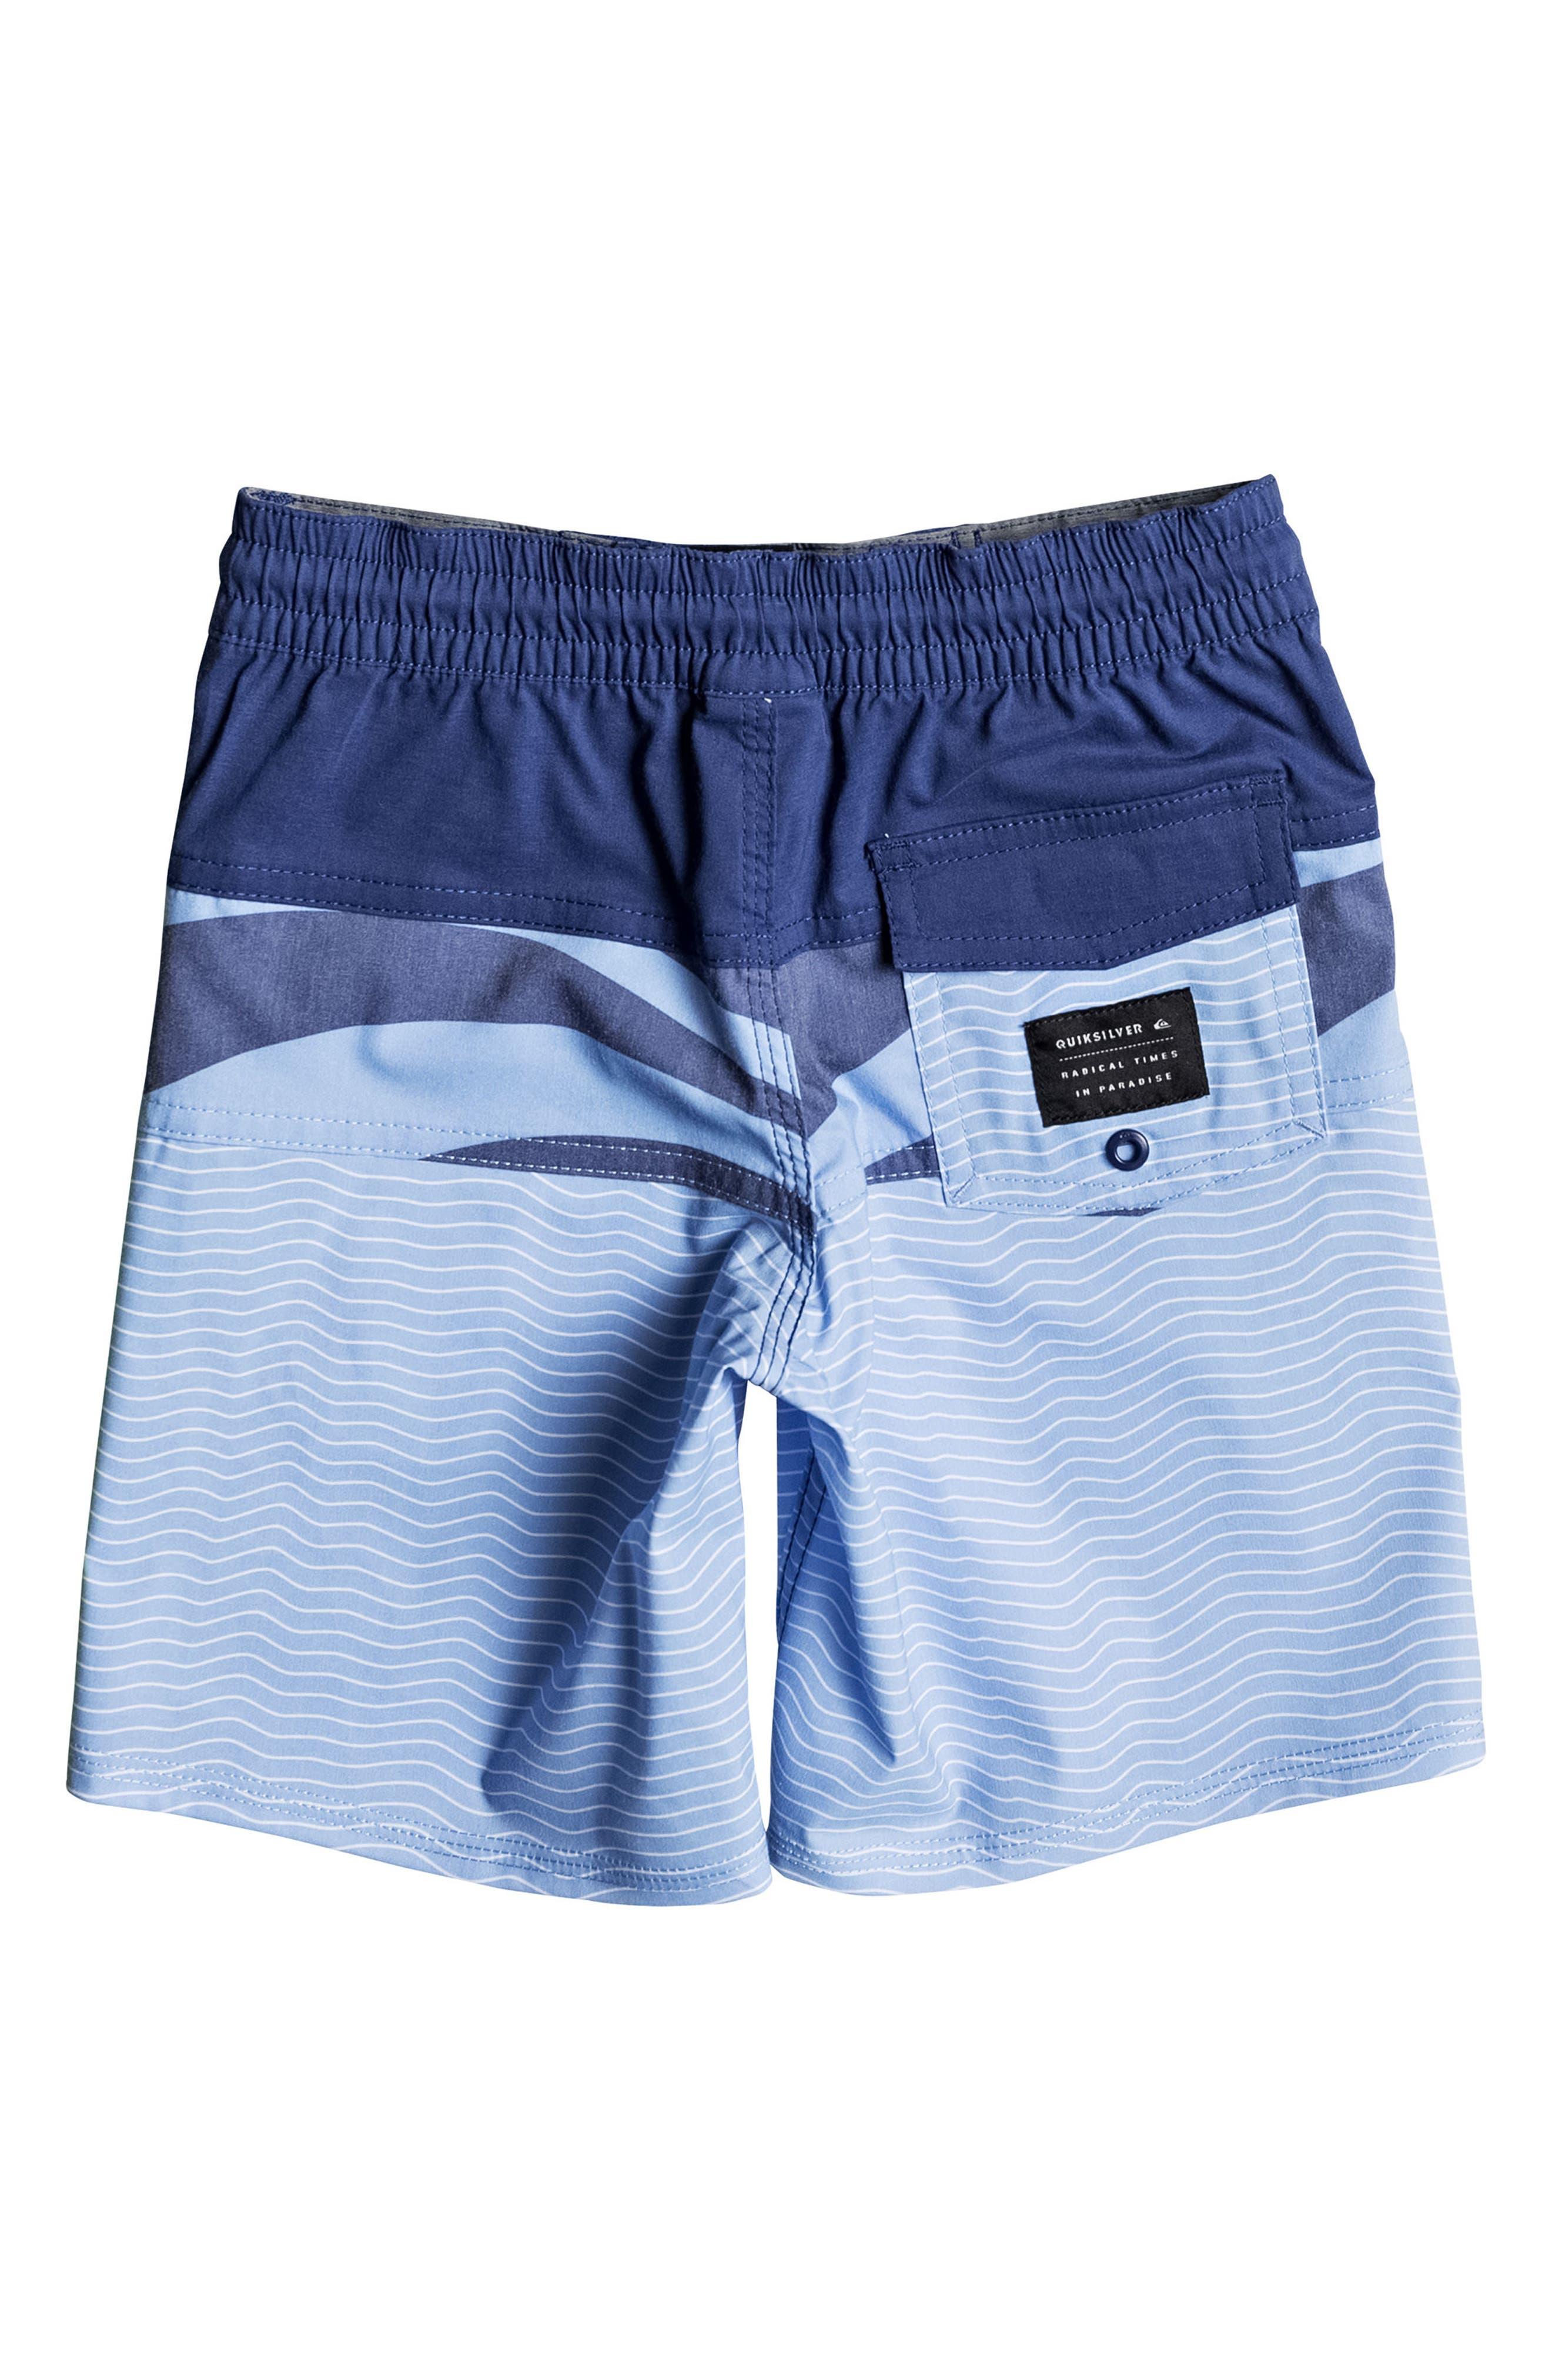 Alternate Image 2  - Quiksilver Heatwave Blocked Board Shorts (Toddler Boys & Little Boys)